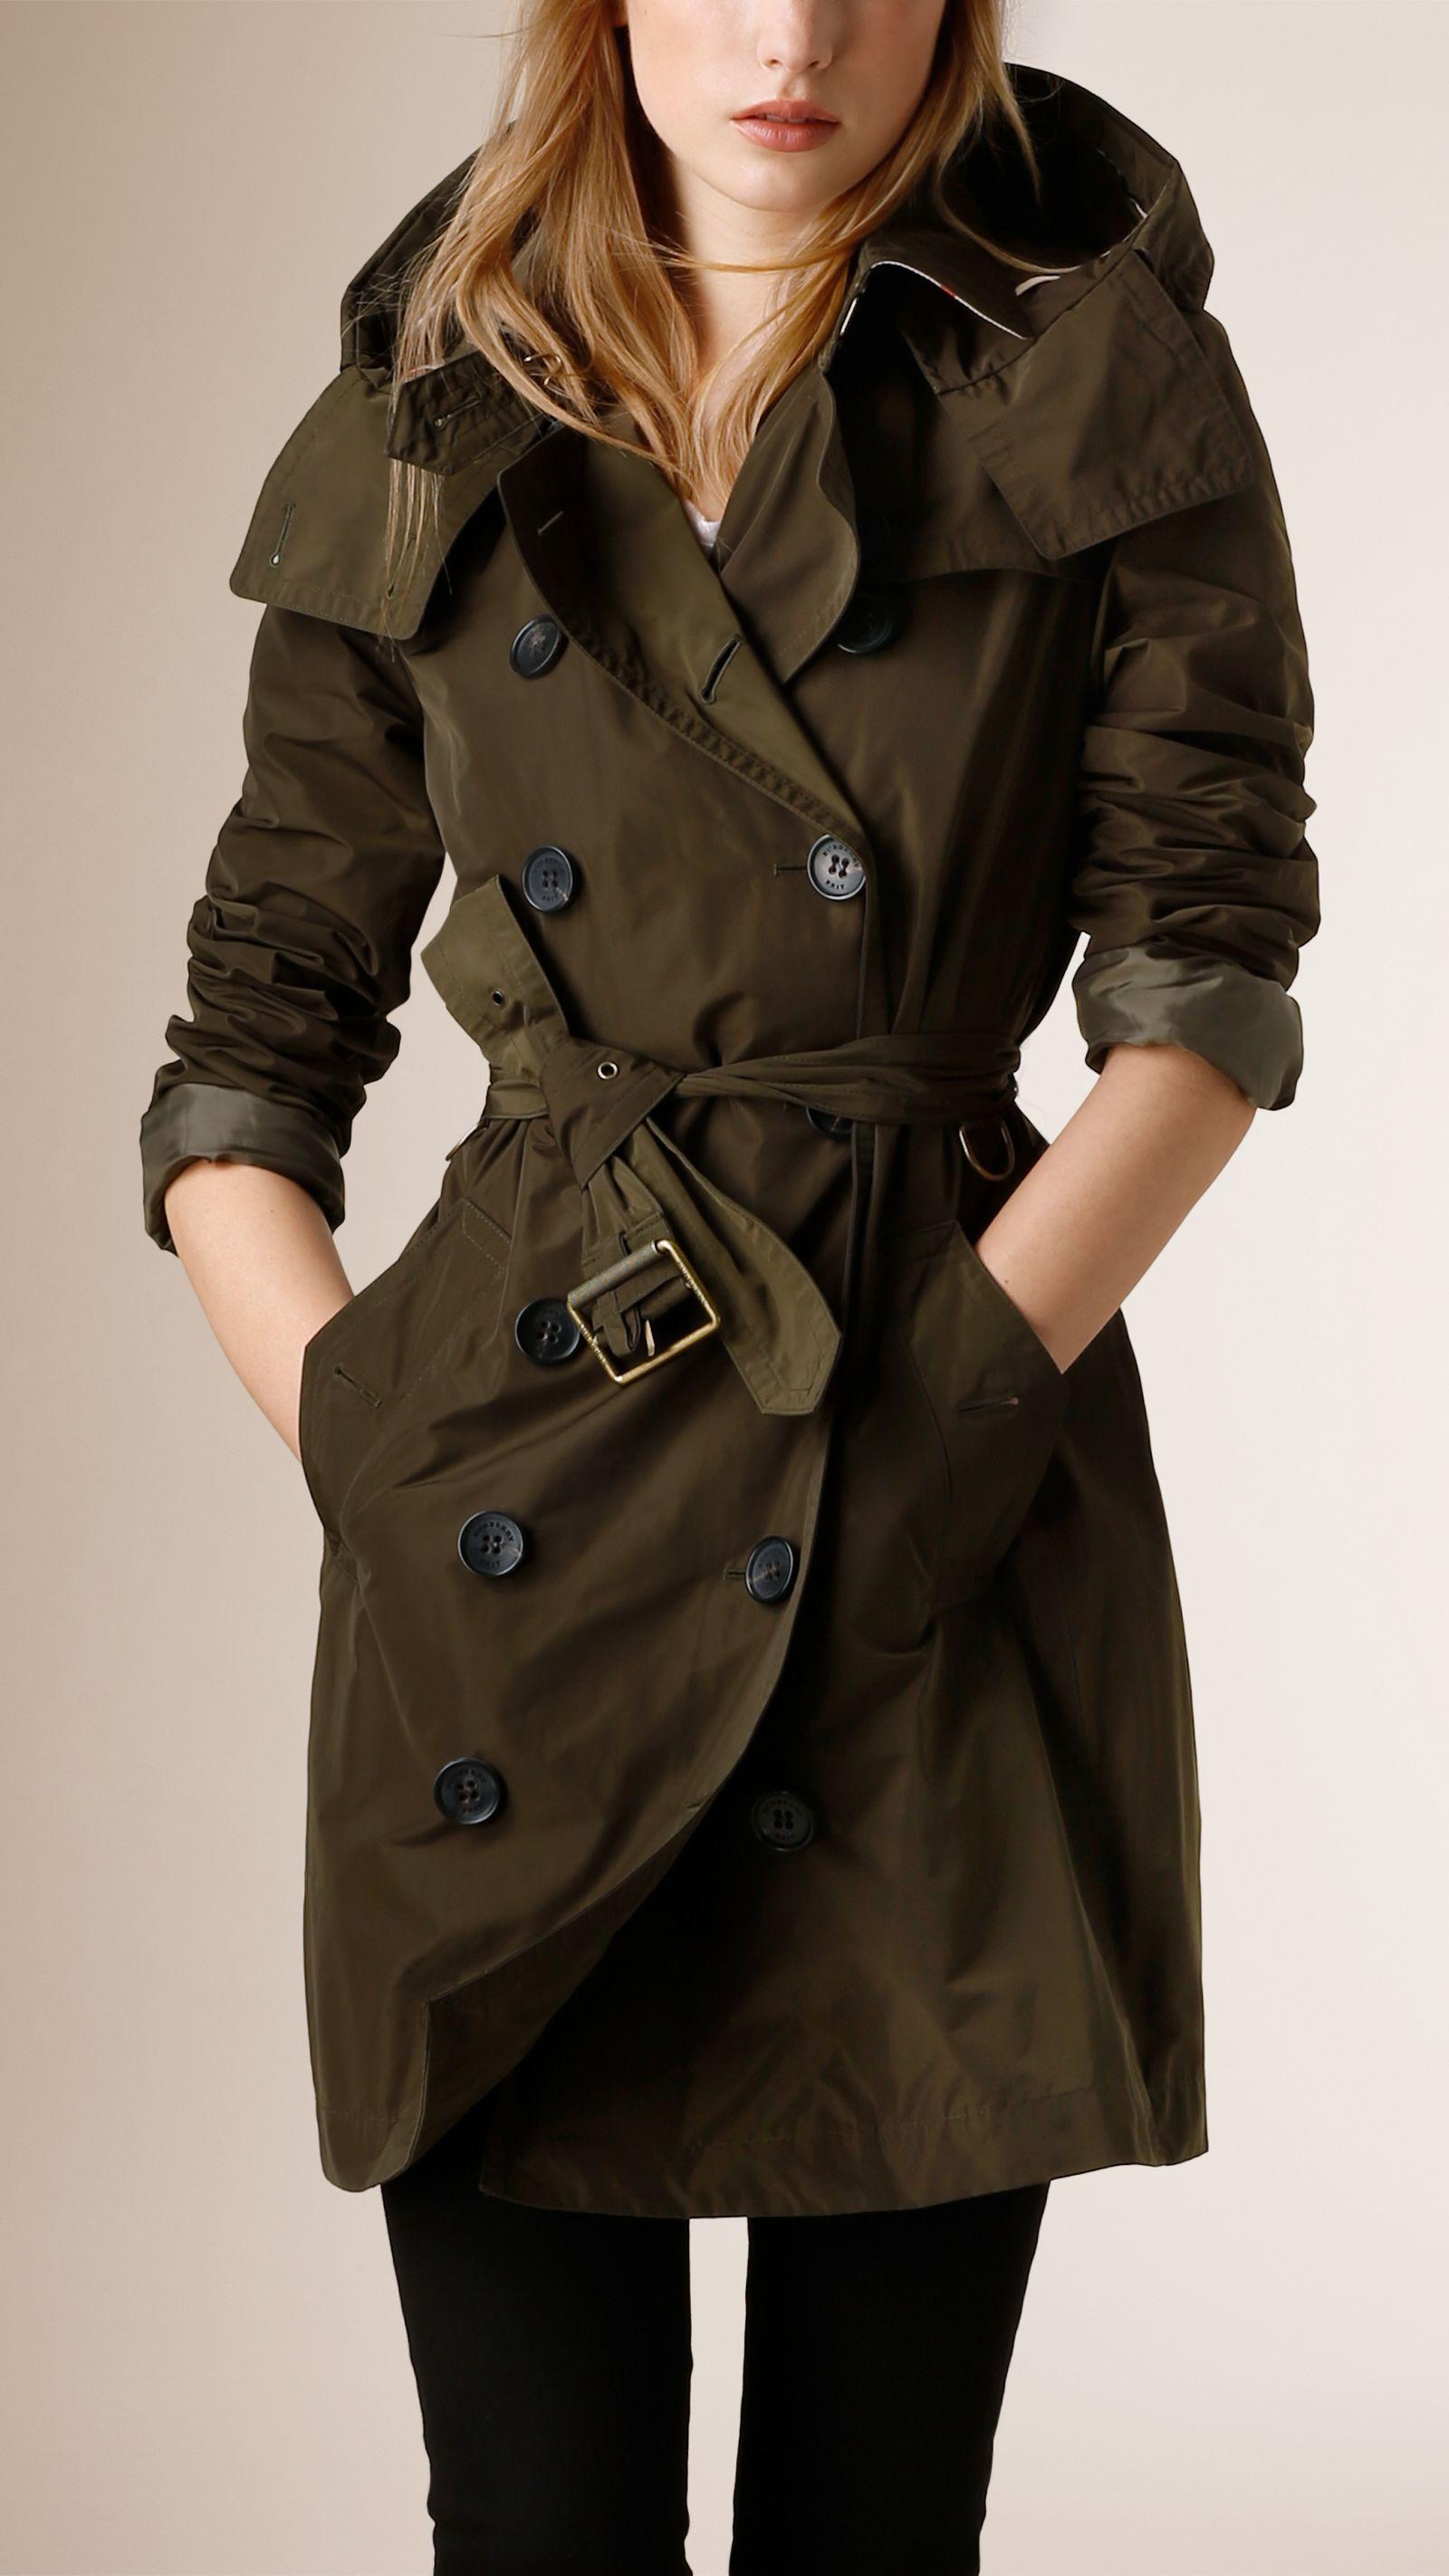 Taffeta Trench Coat with Detachable Hood Dark Olive | Burberry